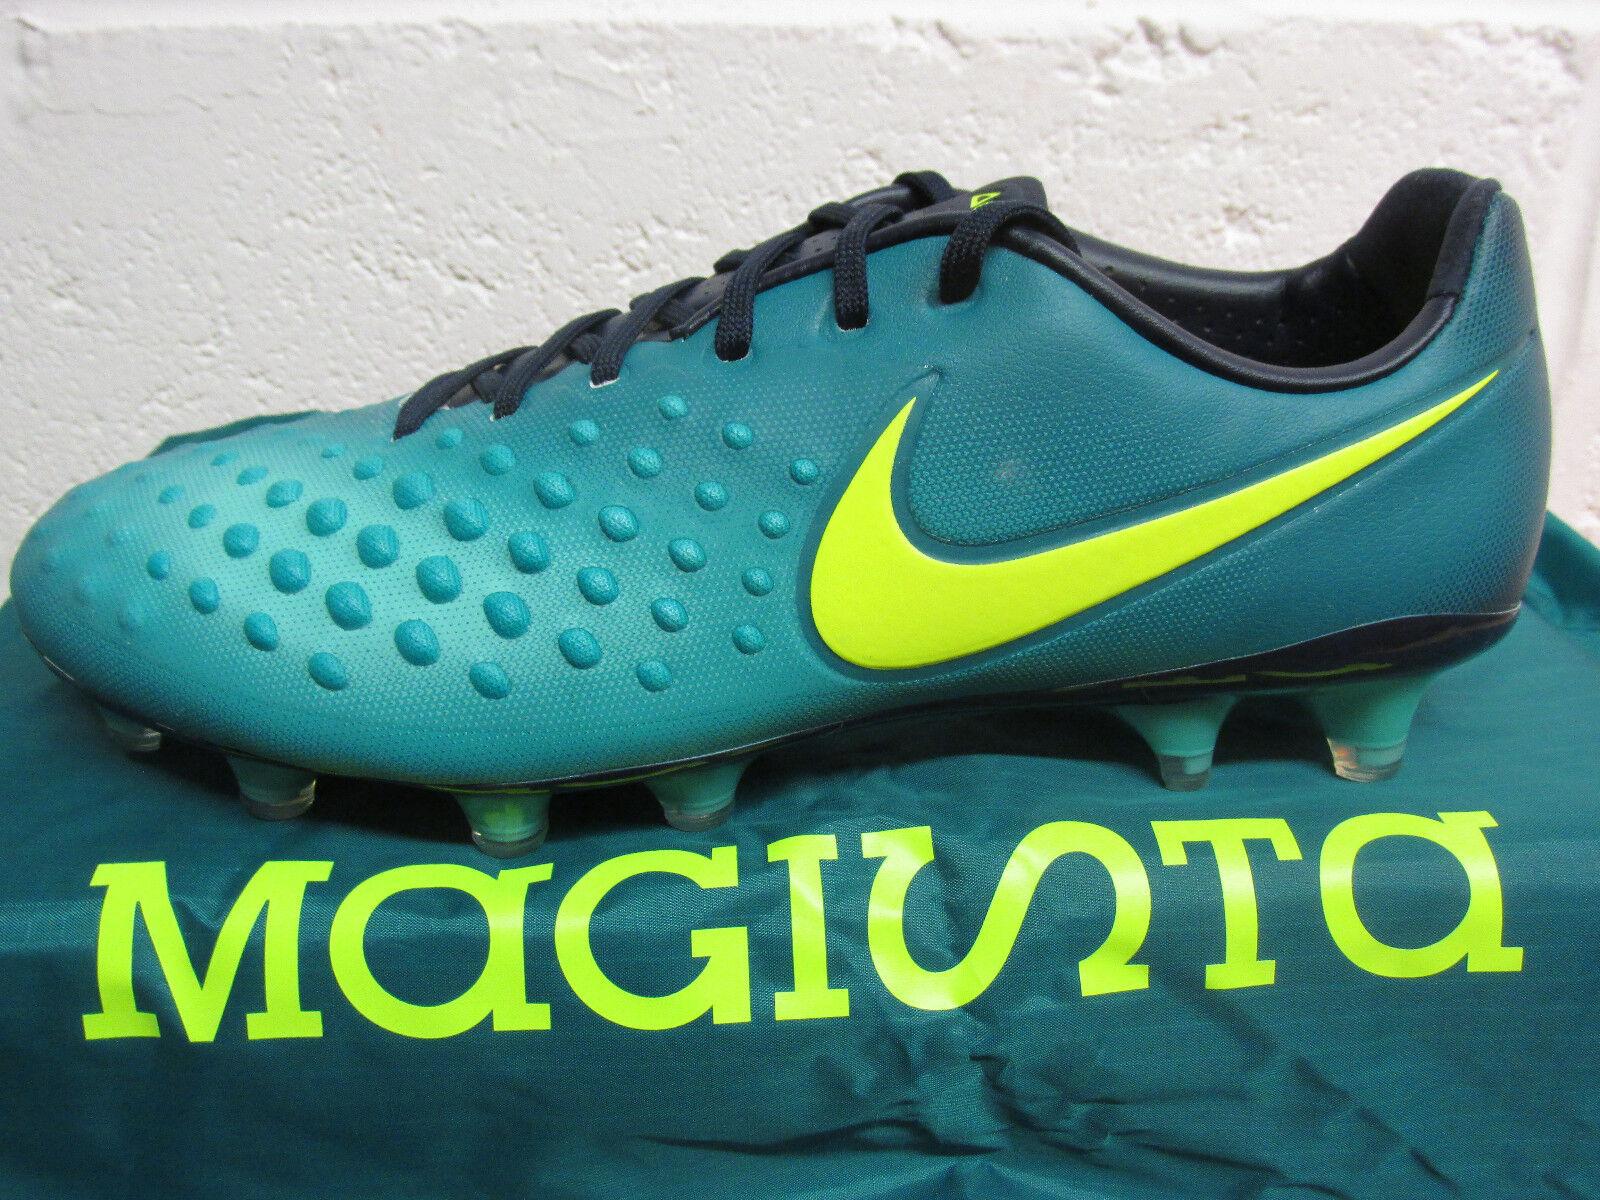 Nike Magista Opus II FG Mens Football Boots 843813 375 Soccer Cleats Cheap and beautiful fashion